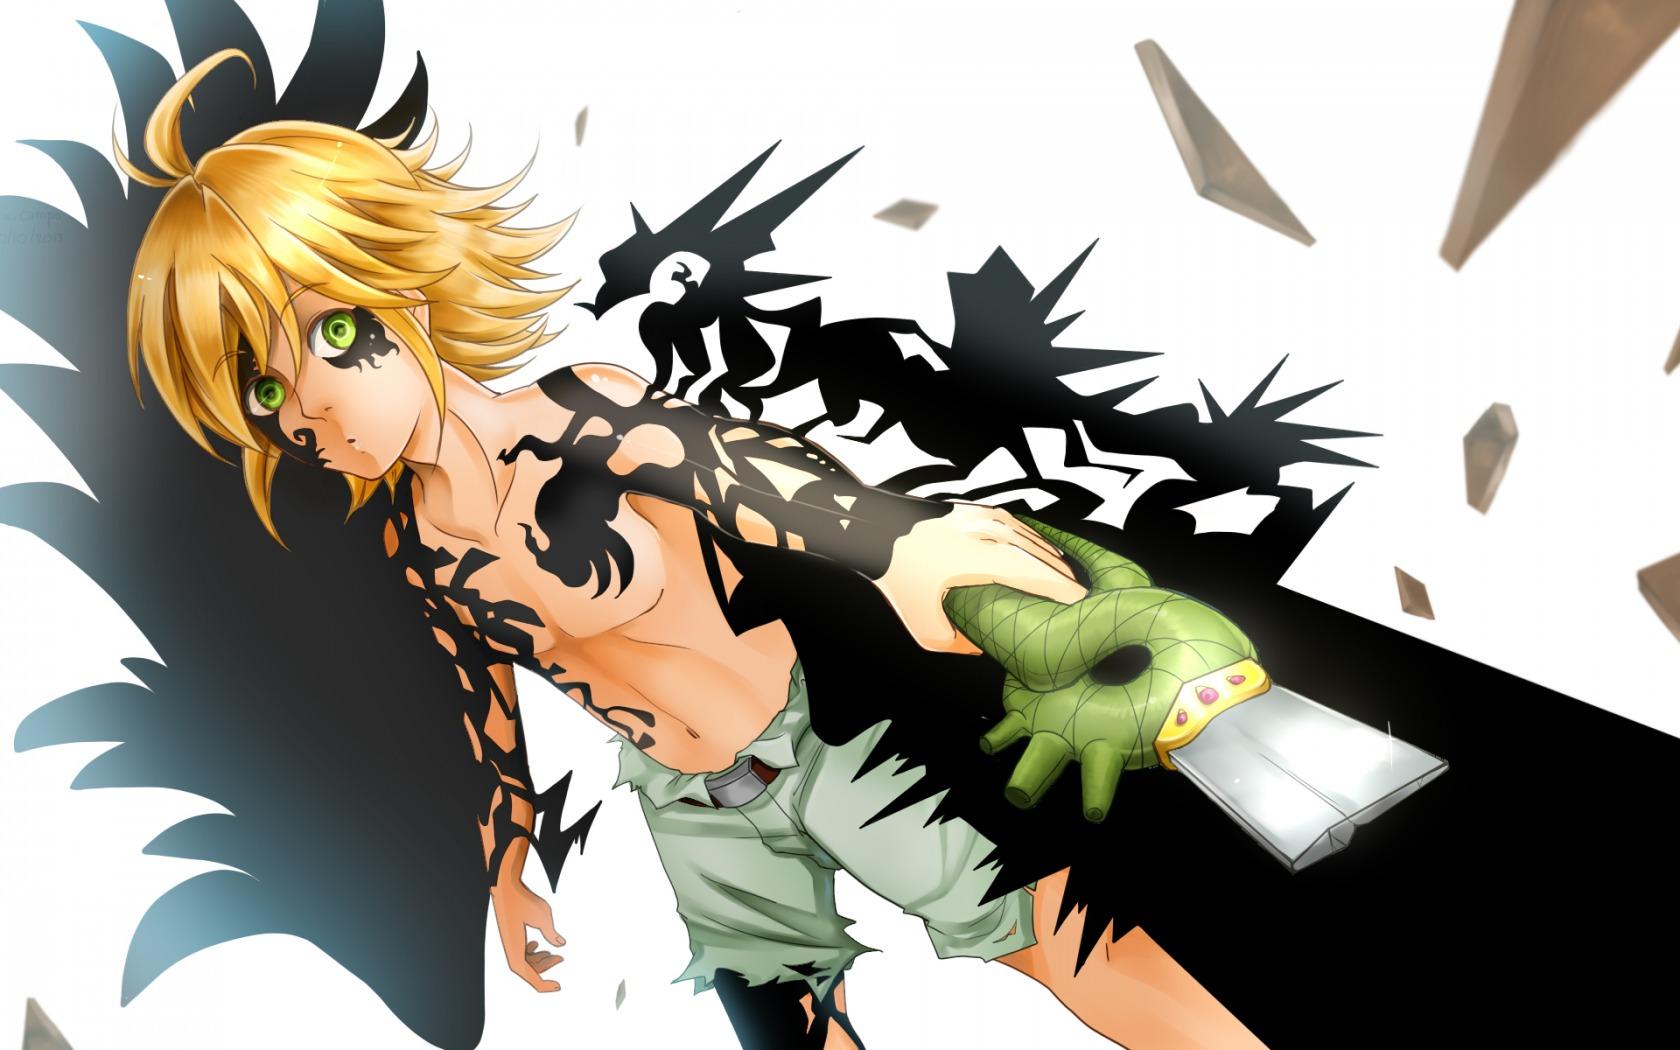 Deadly Sins Anime Wallpaper anime girl wallpaper by billgate 1680x1050